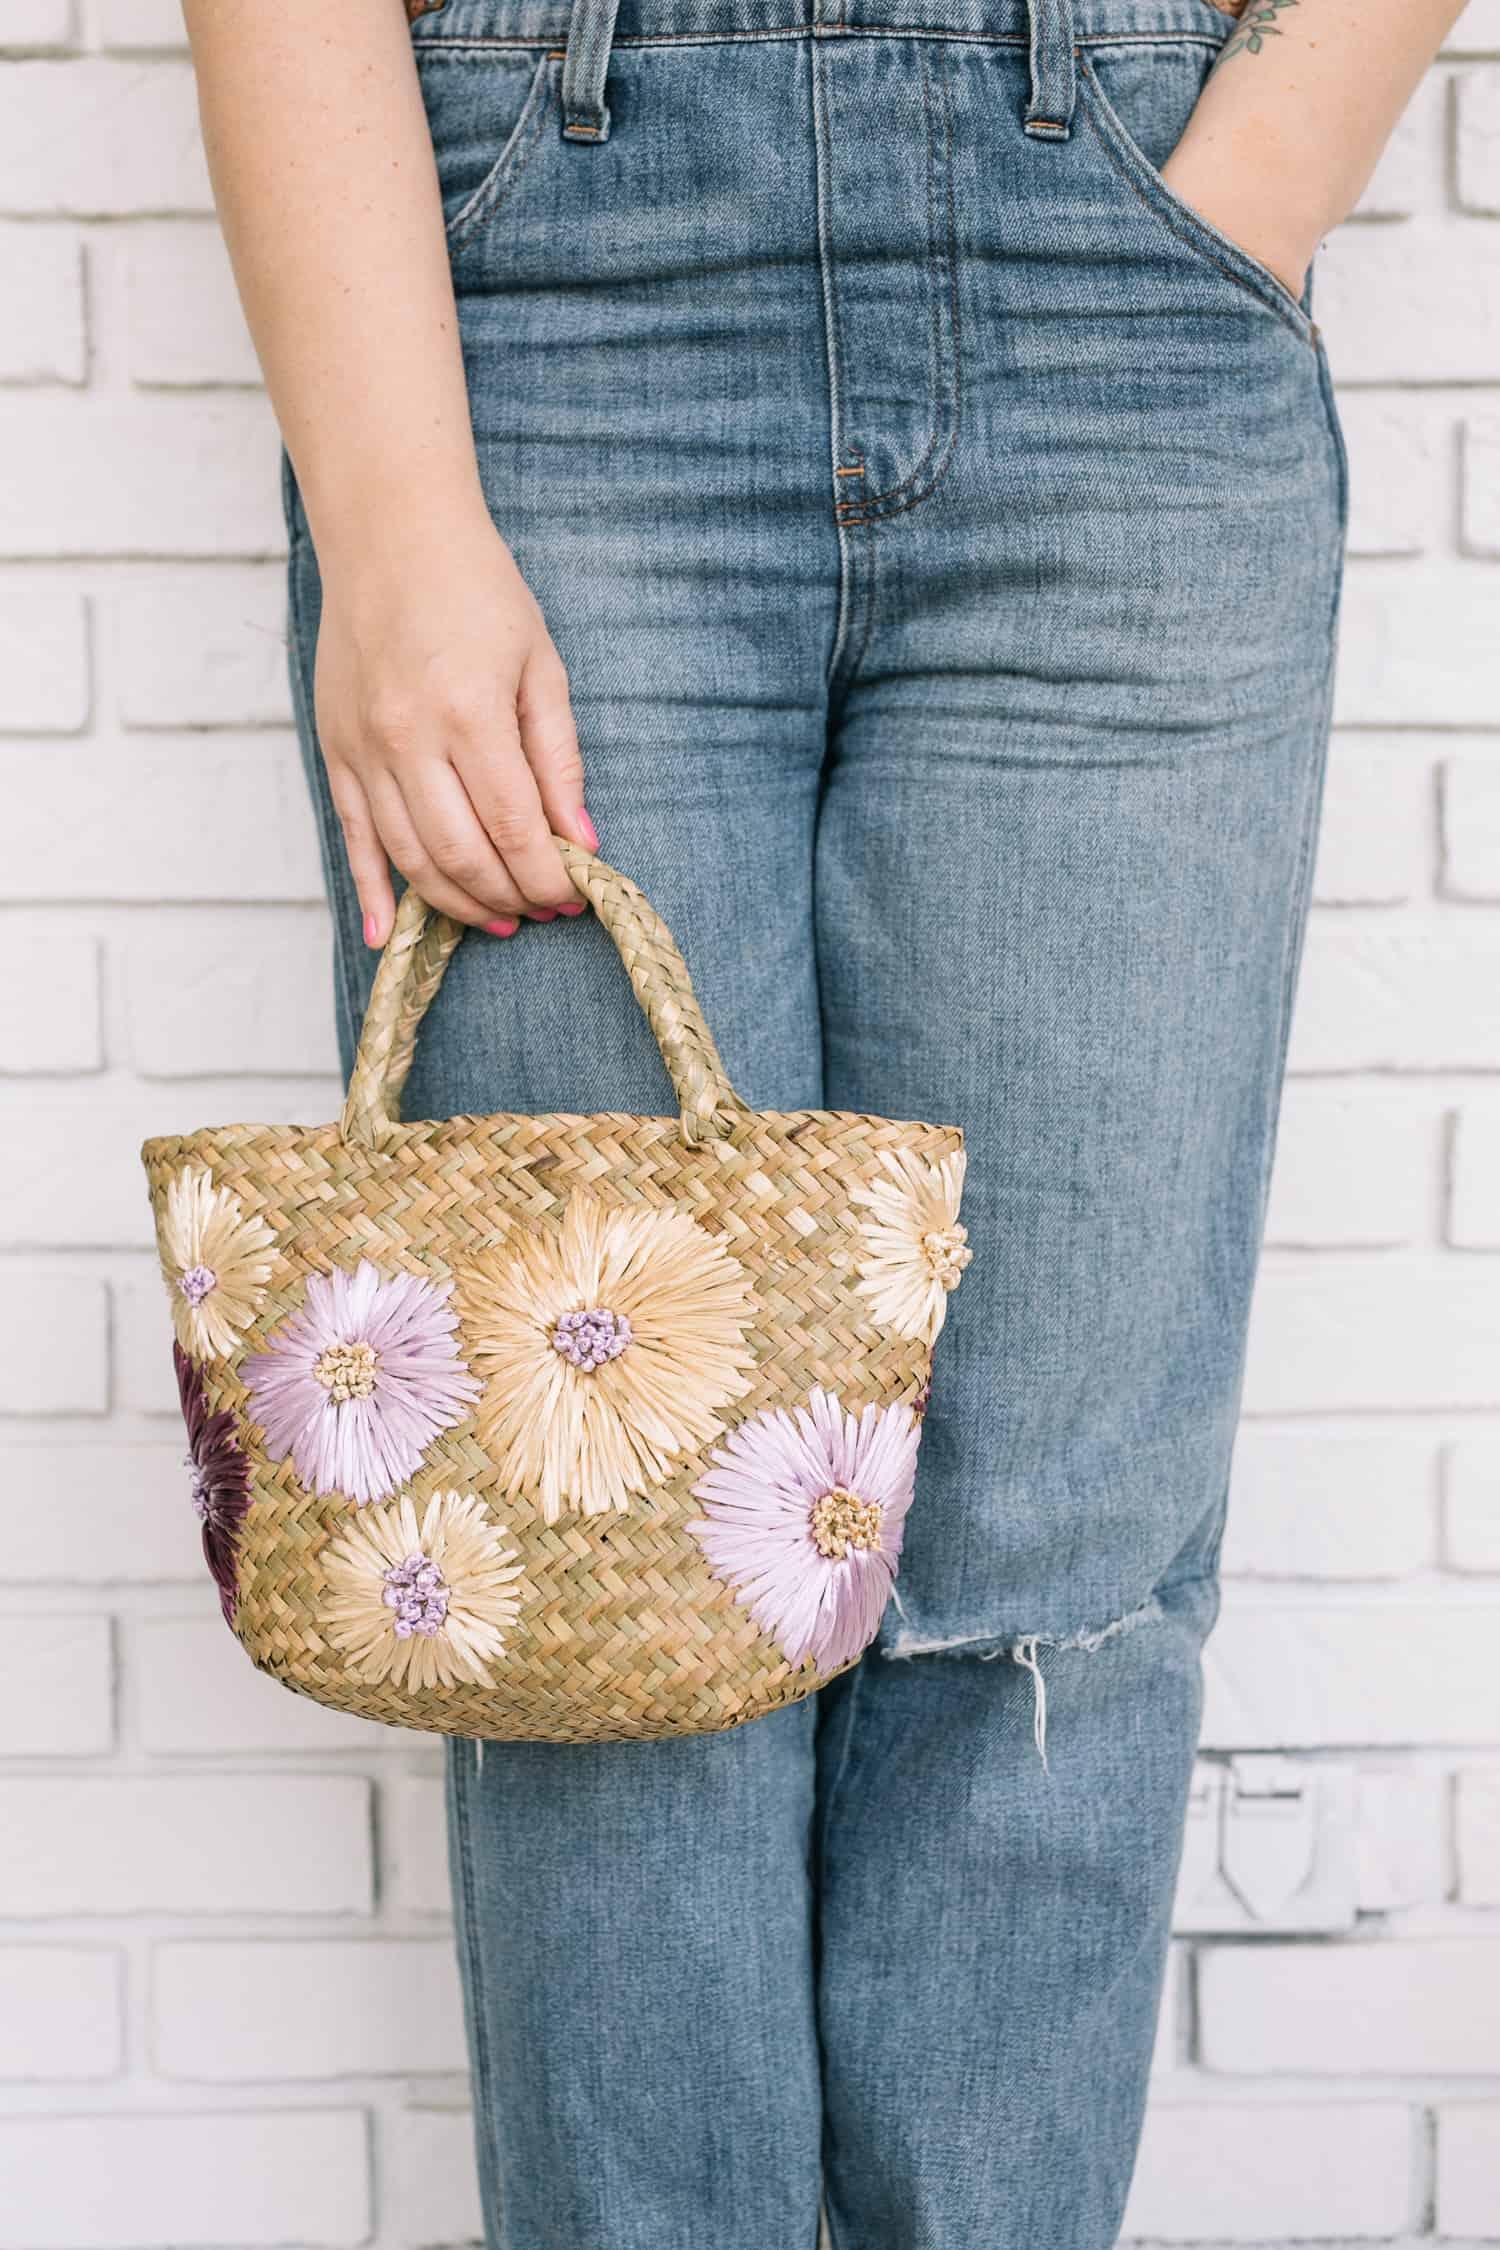 DIY Stitched Floral Purse